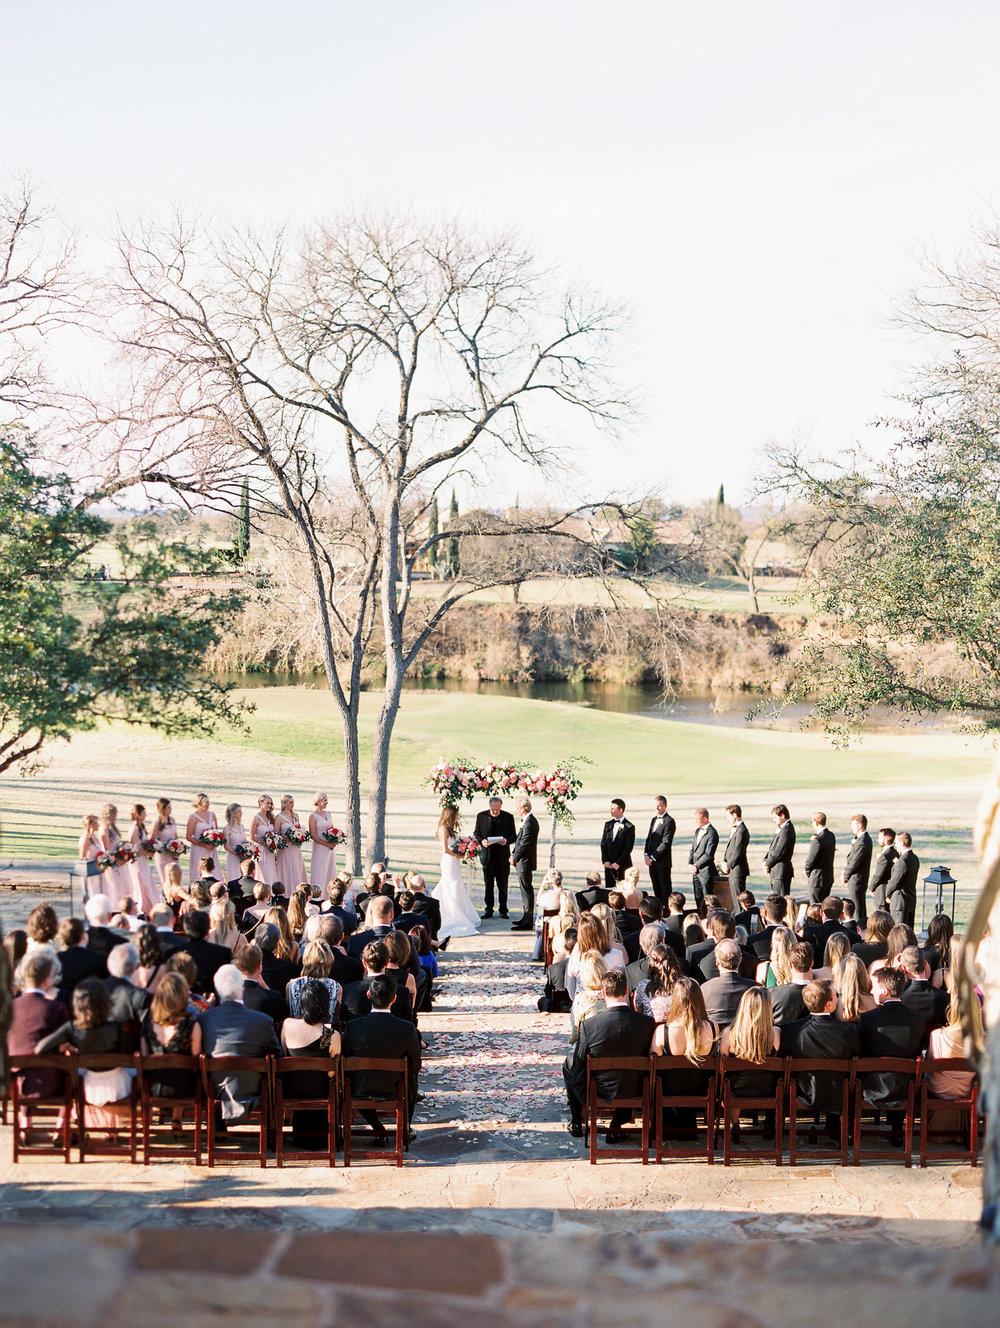 Escondido-Golf_Lake-Club-Hill-Country-Houston-Wedding-Photographer-Best-Top-Luxury-Destination-Engagements-Portrait-Austin-Photography-90.jpg